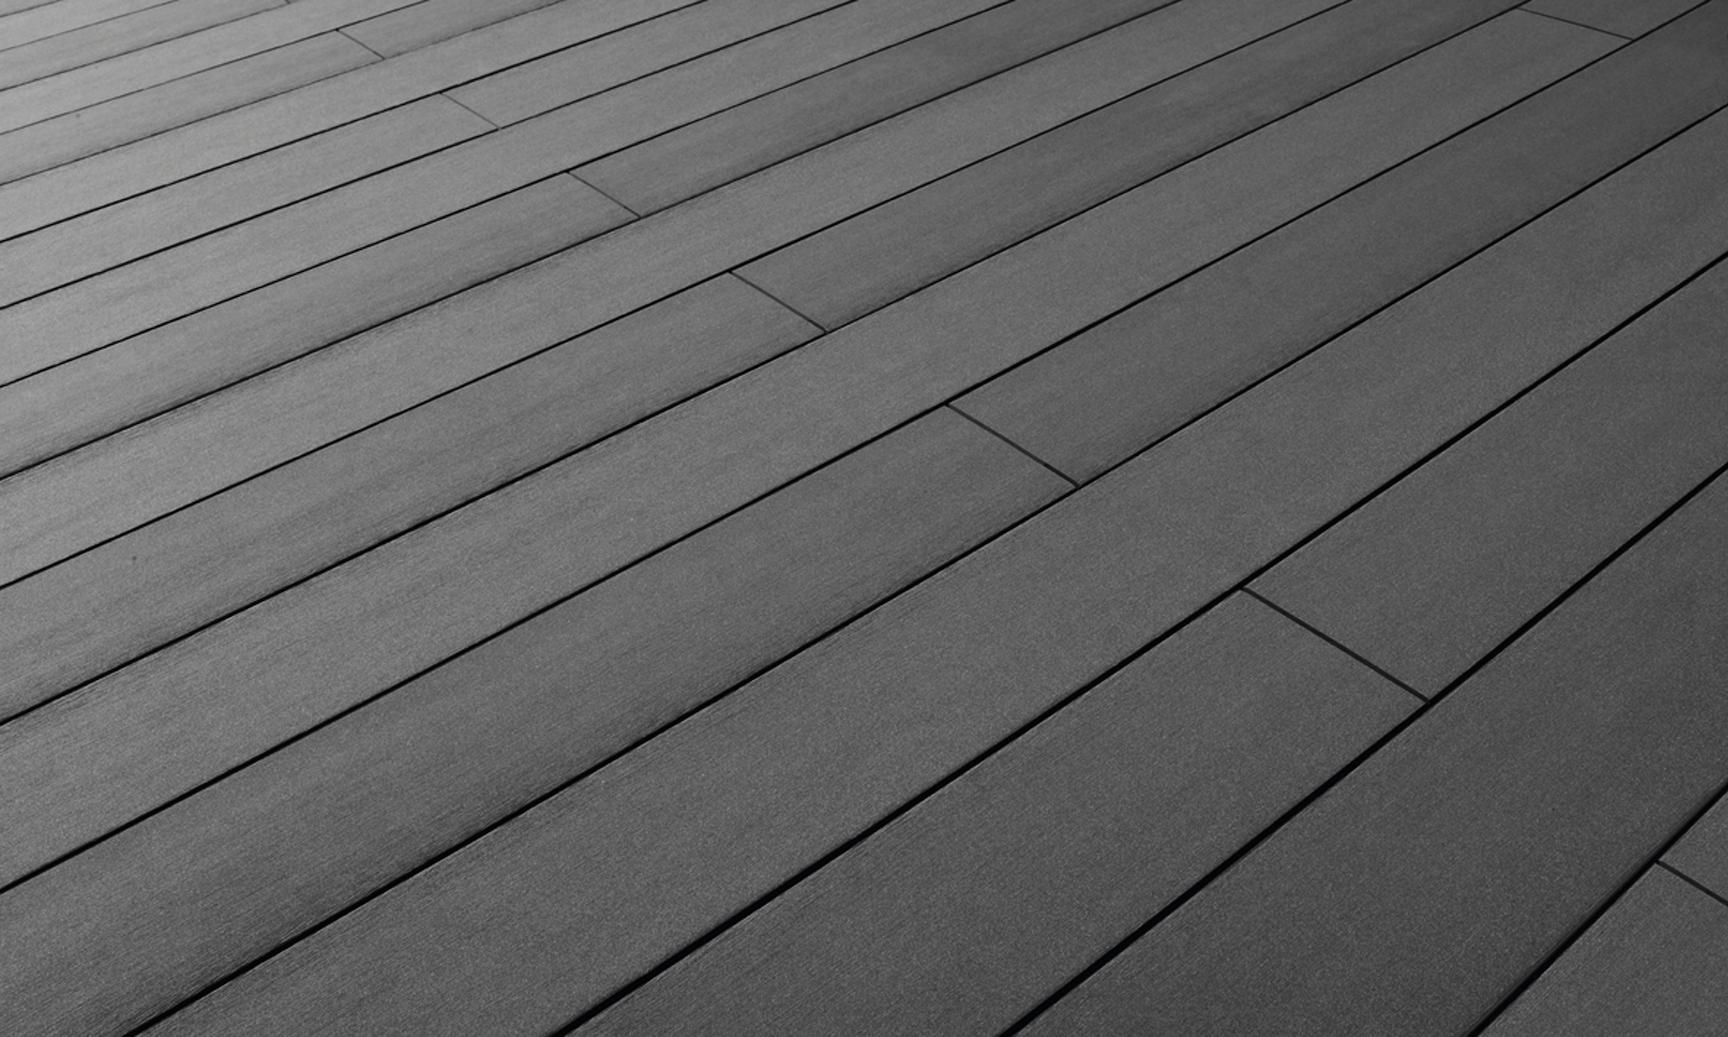 terrafina-composite-decking-plain-graphite-surface-finish